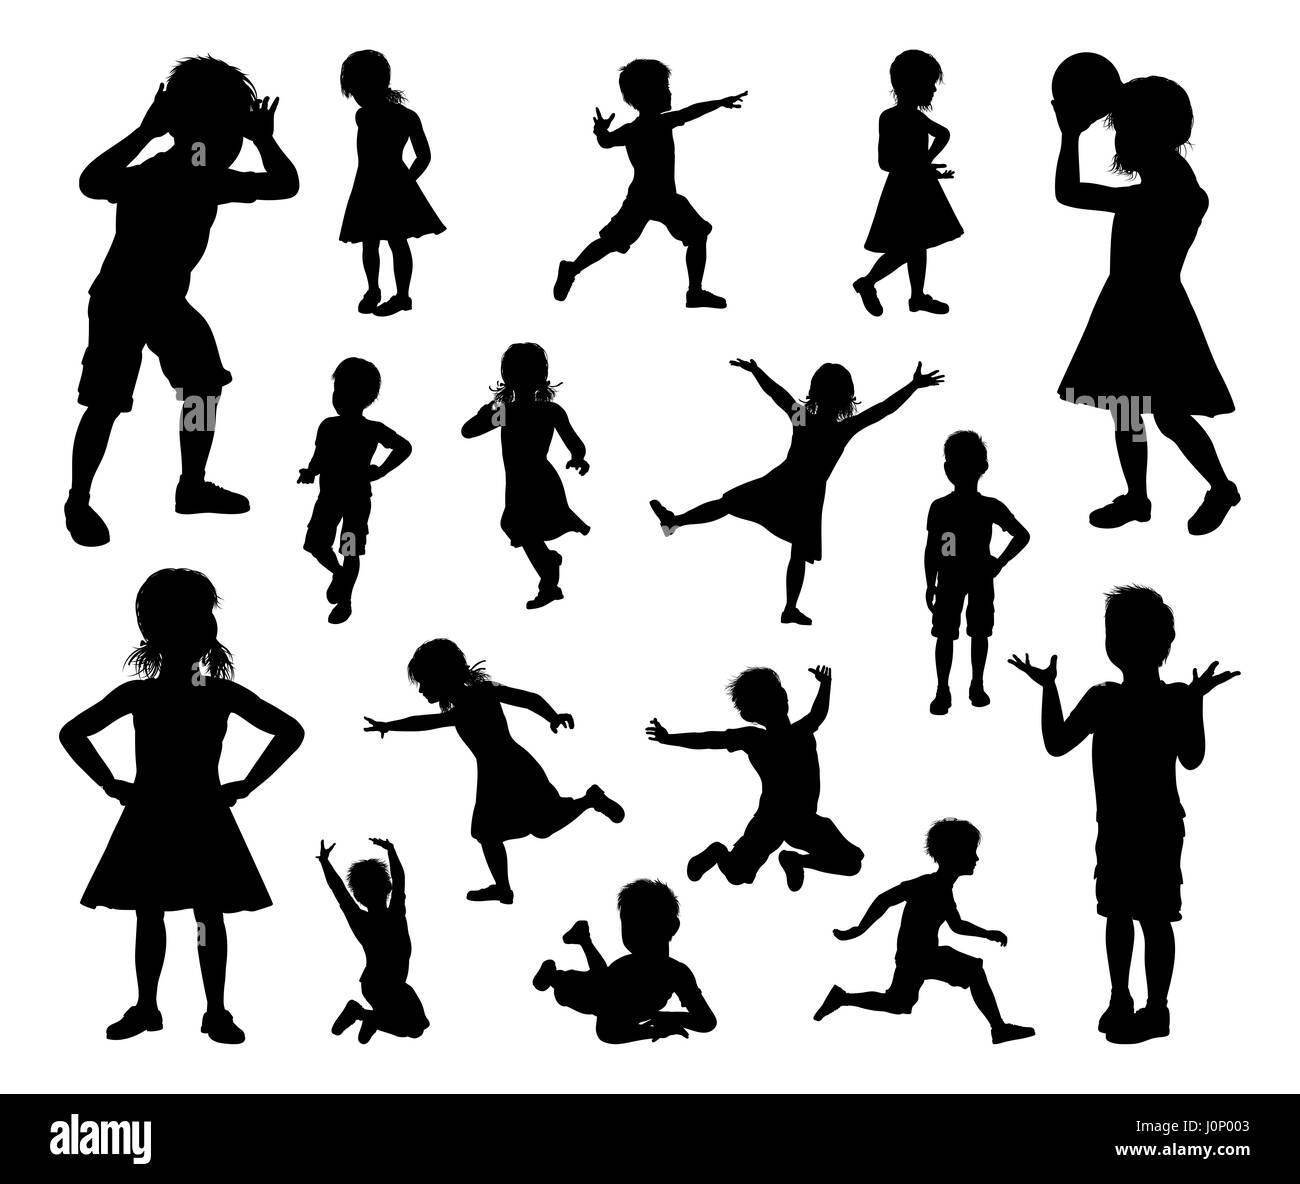 Kids running silhouette vector